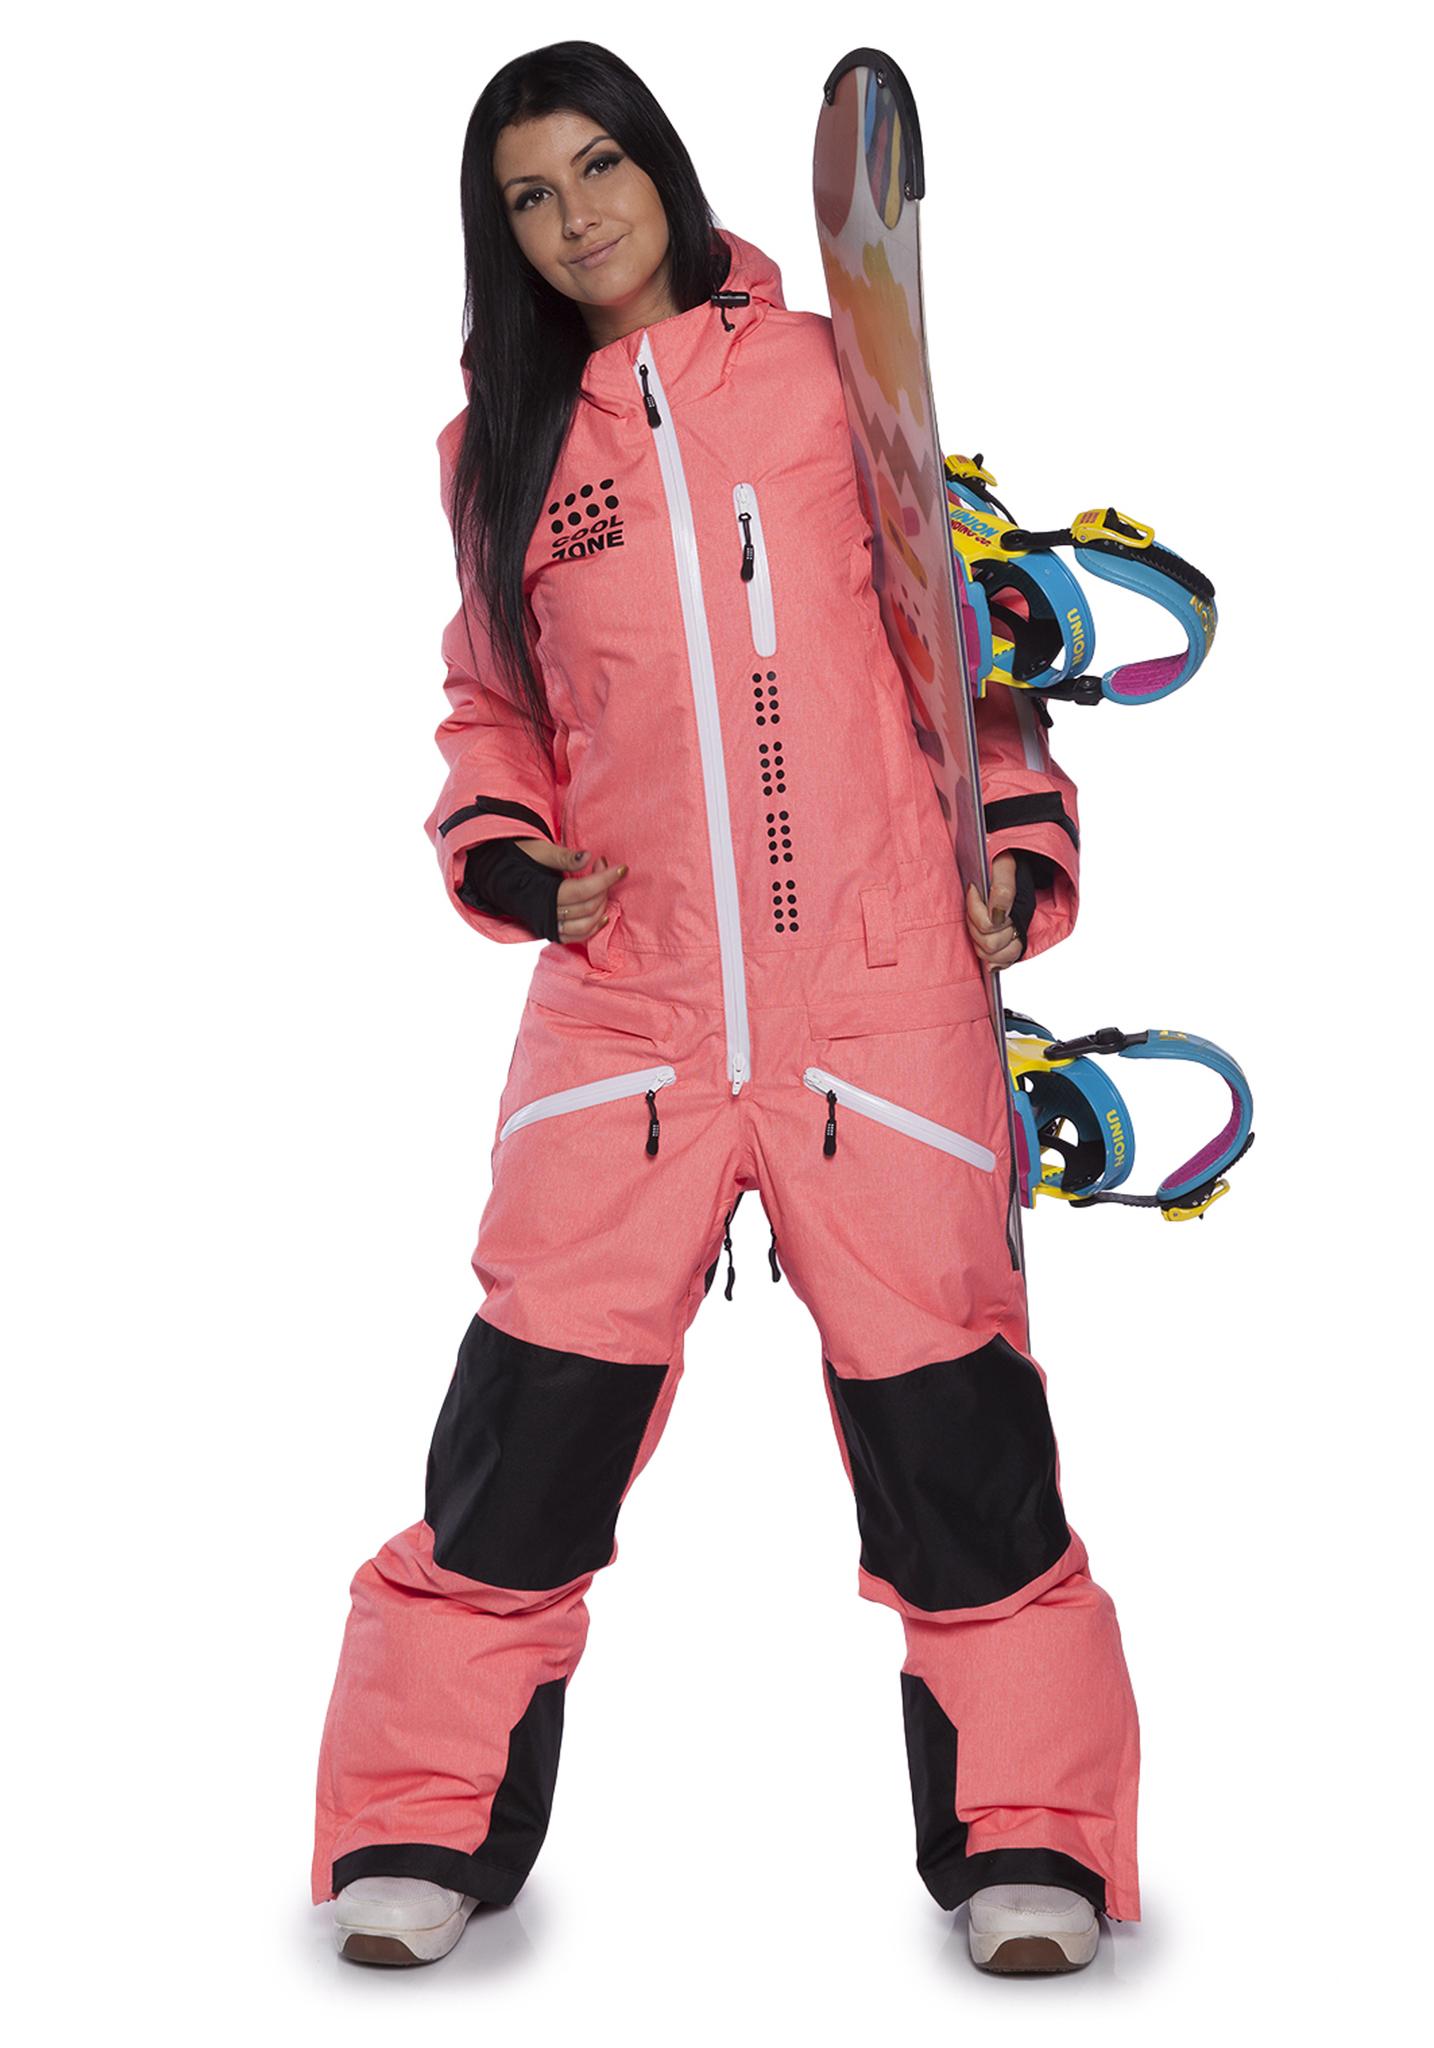 Женский сноубордический комбинезон Кул Зон кайт  31К17М оранжевый